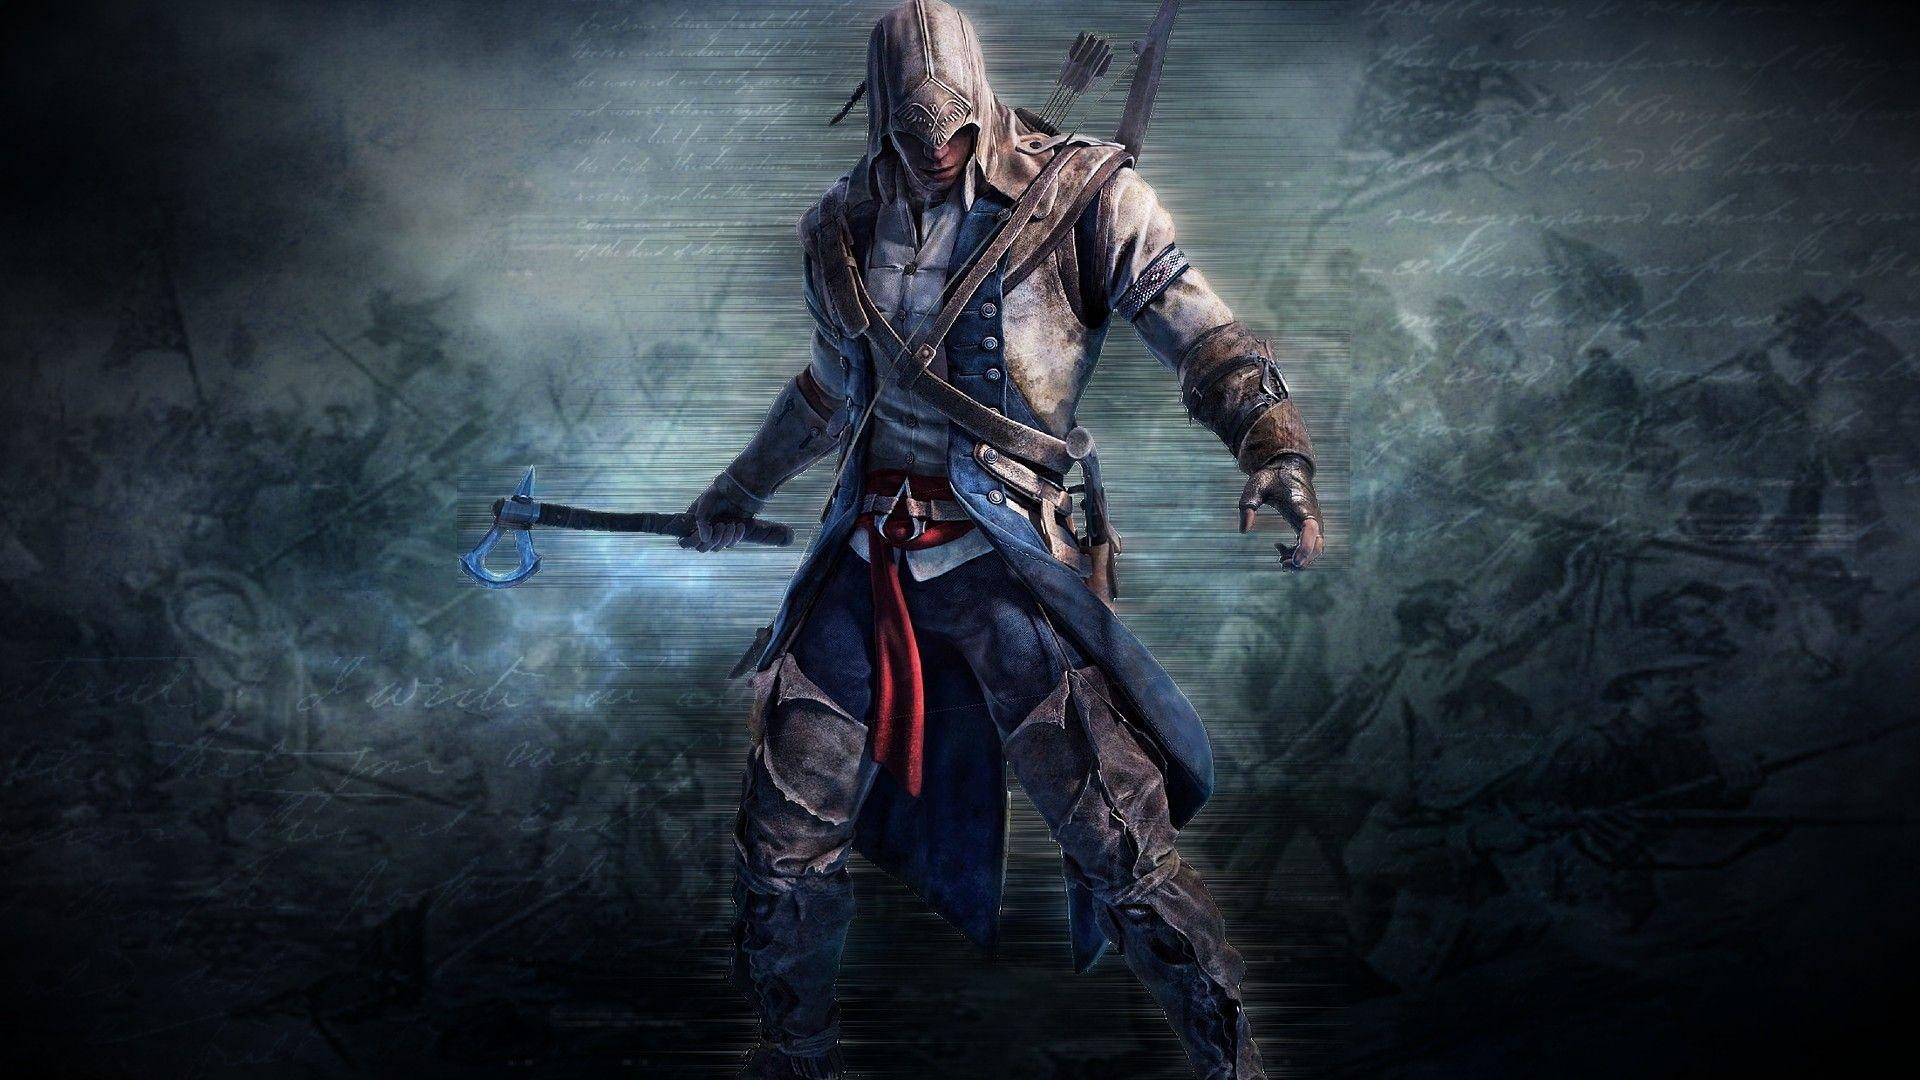 assassins creed 5 wallpaper - photo #1